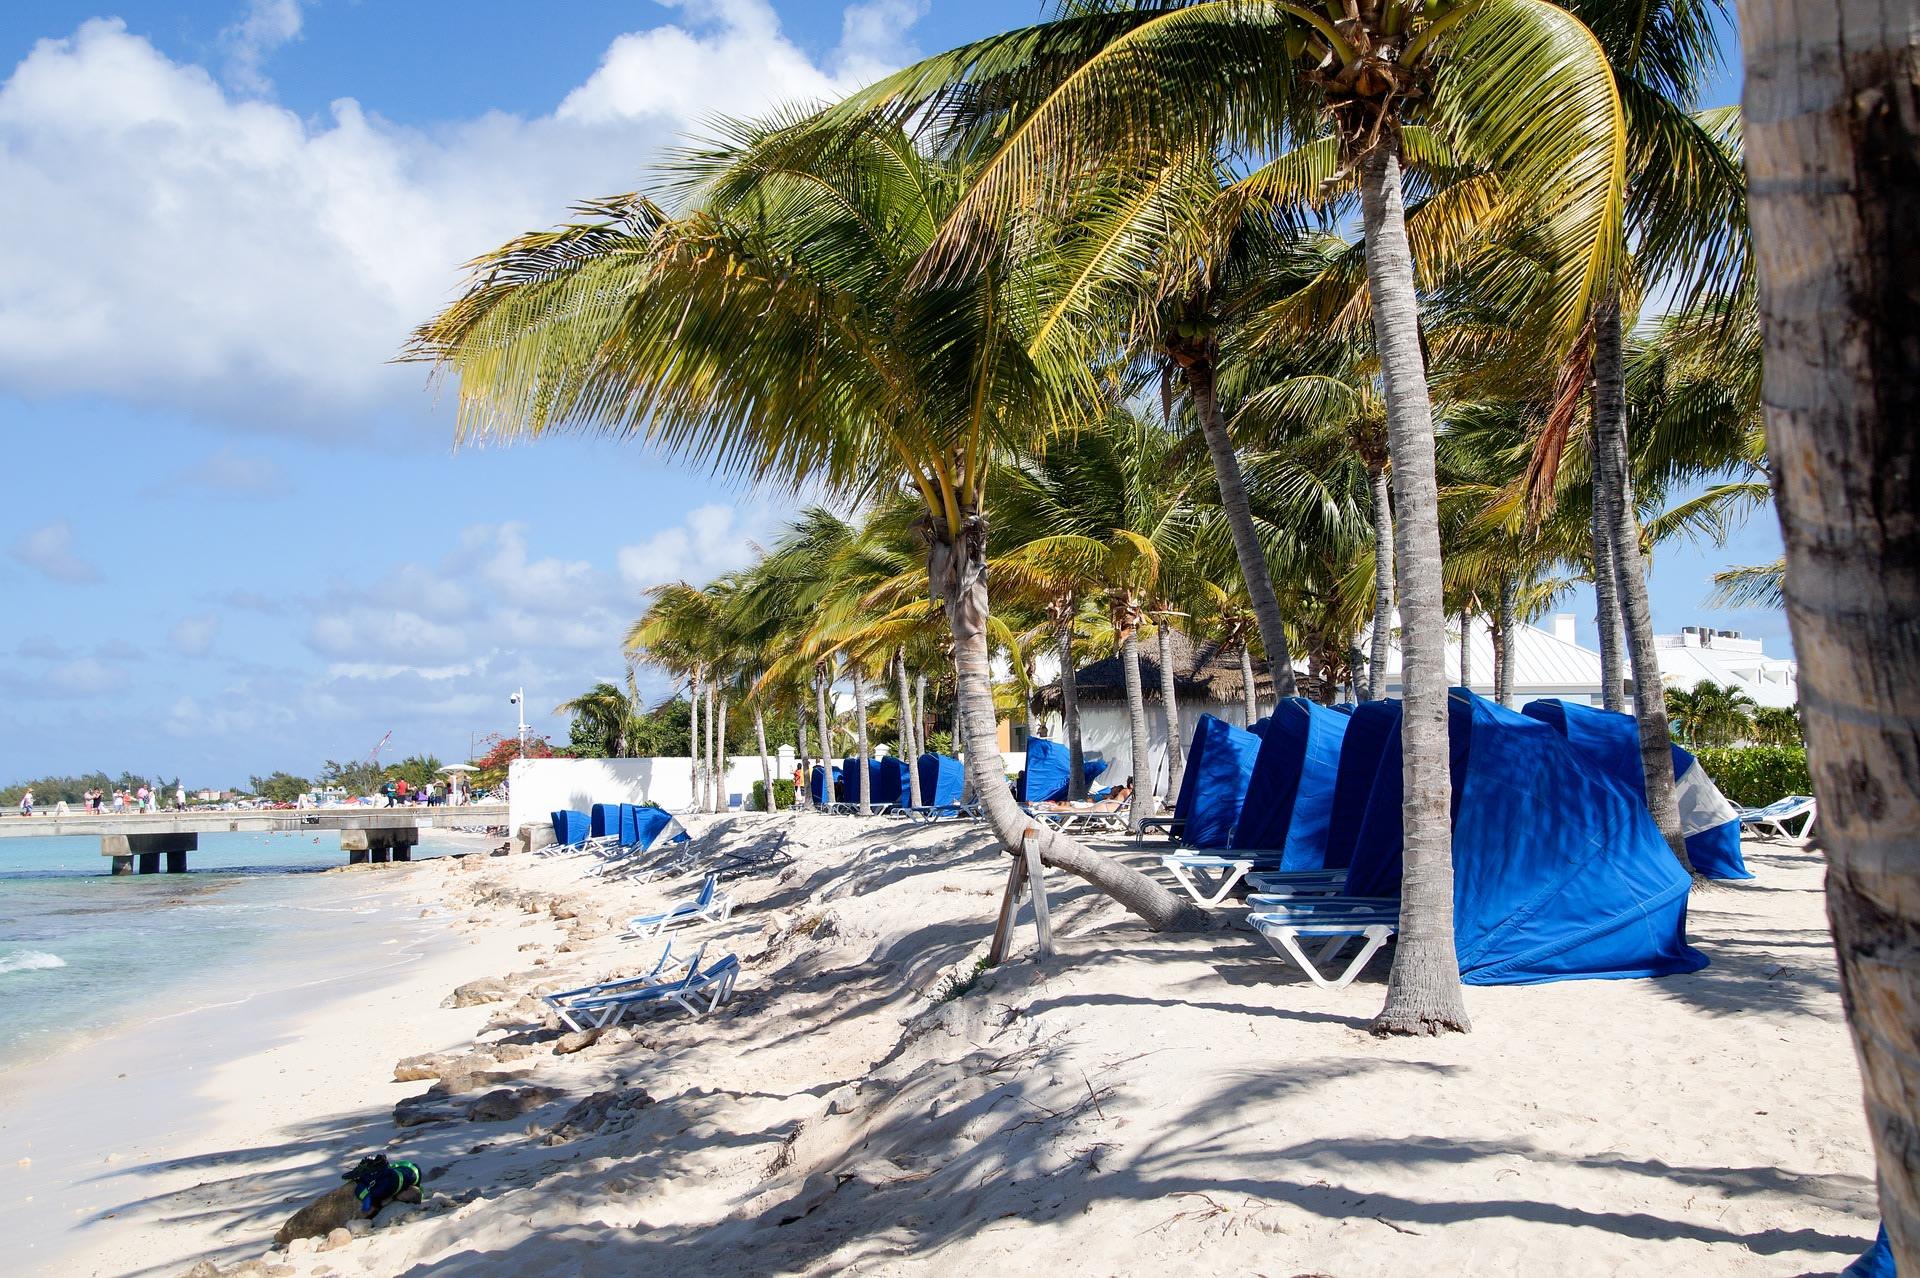 Explore Turks and Caicos